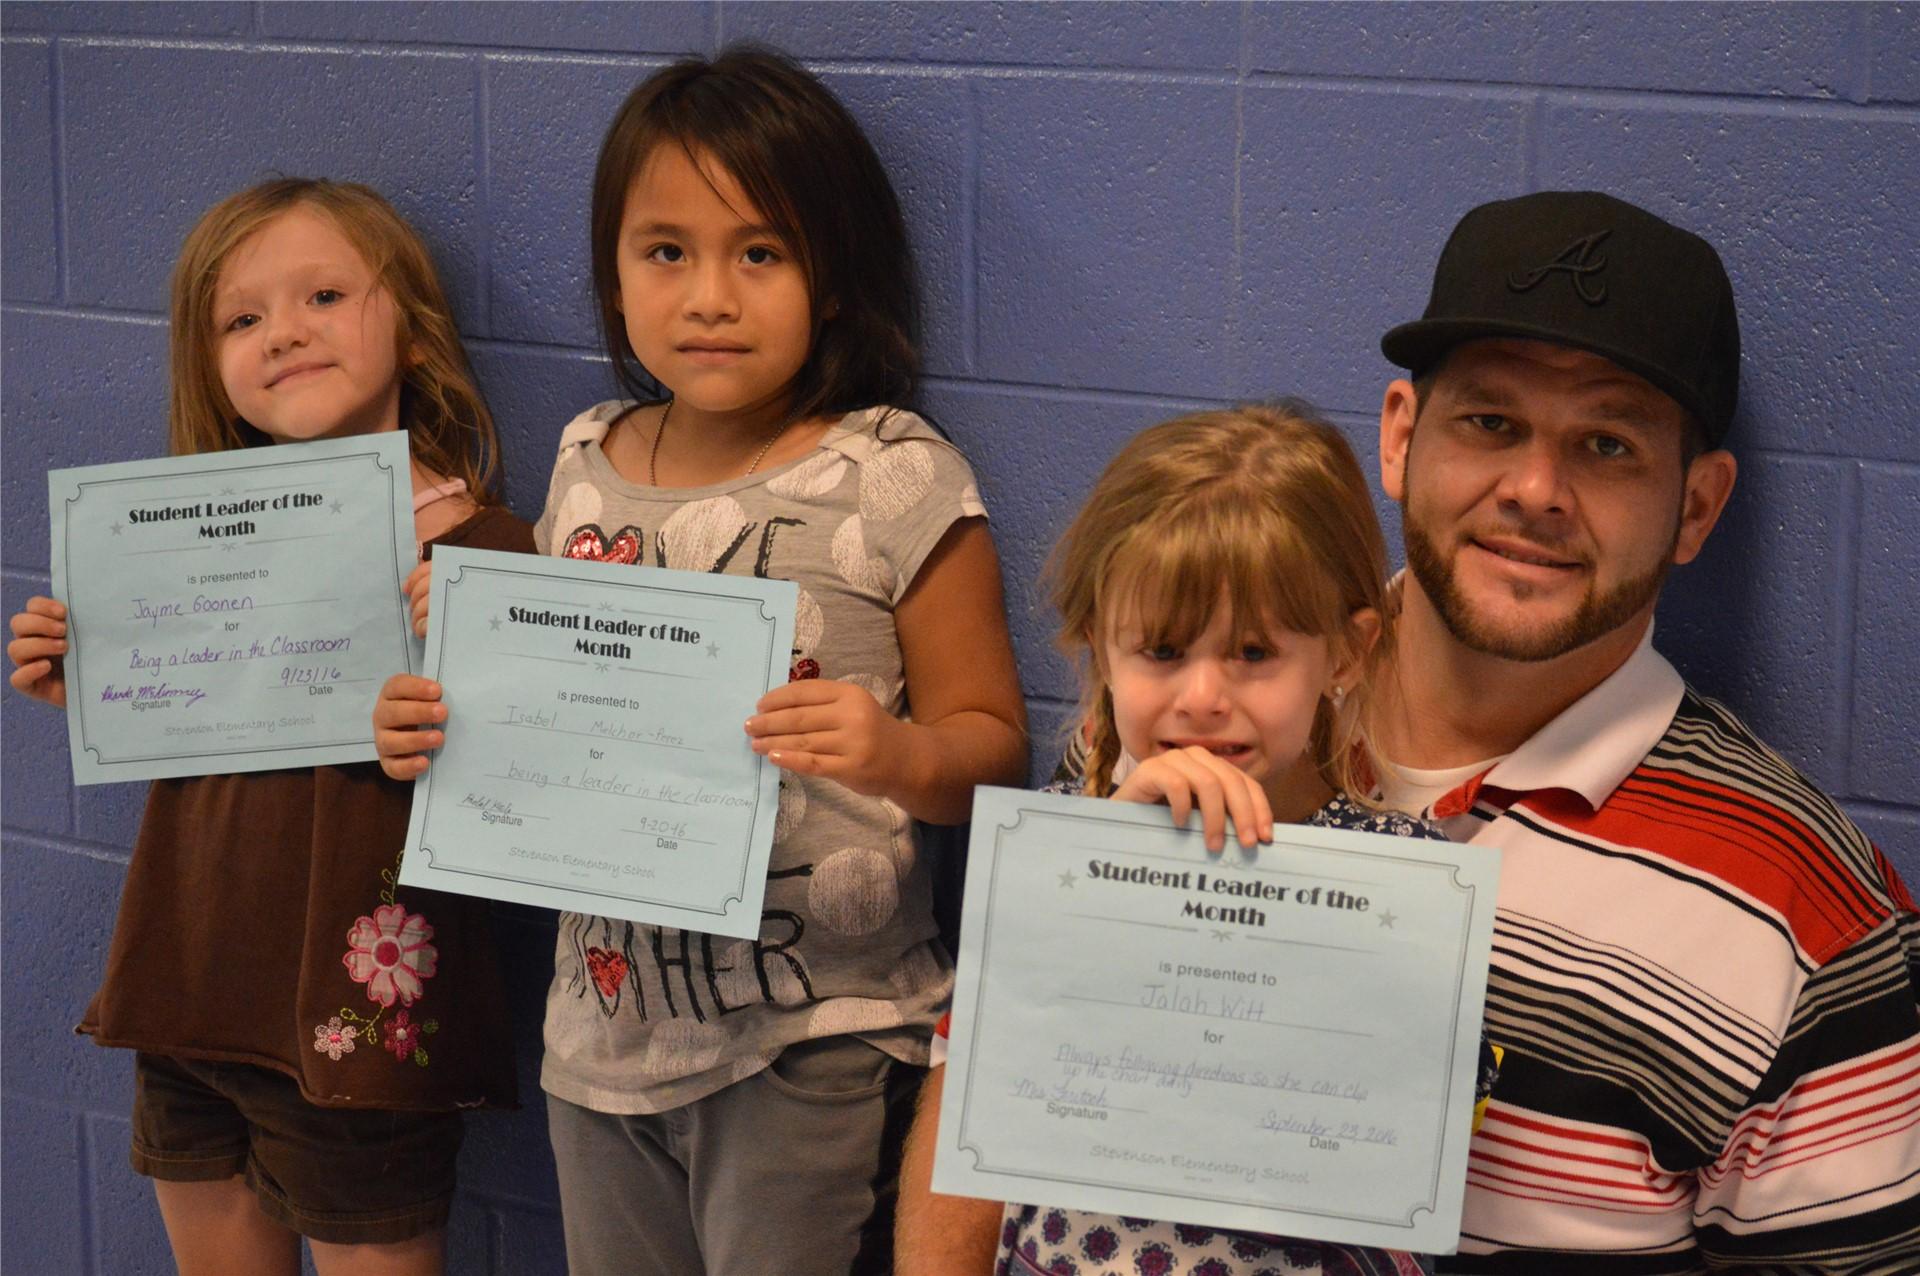 (L-R) Kindegarten:  Jayme Goonen; 1st Grader, Isabel Melchor-Perez; Jalah Witt & her dad, Justin